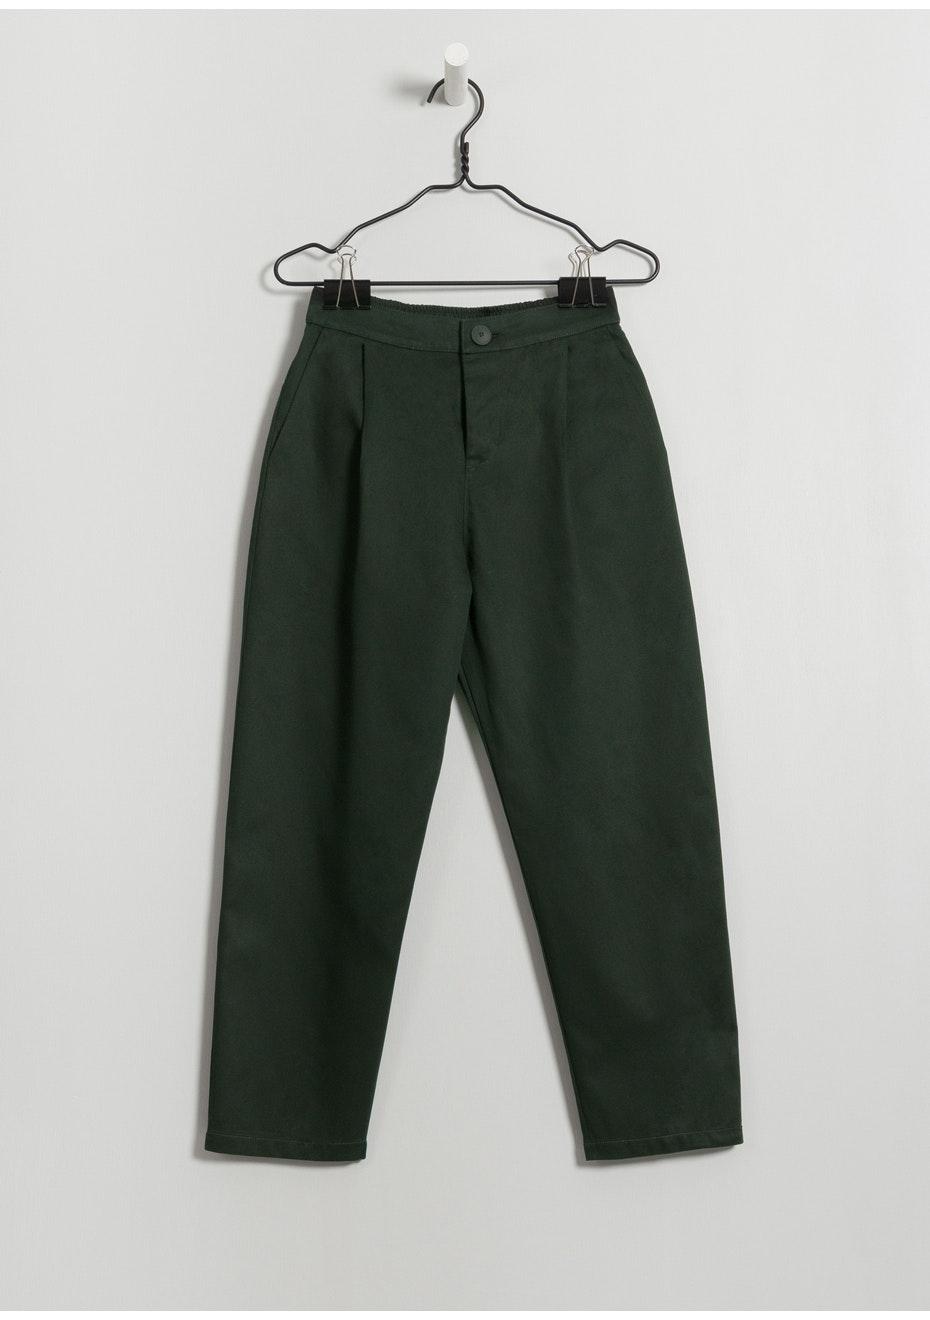 Kowtow - Ritual Pant - Dark Green